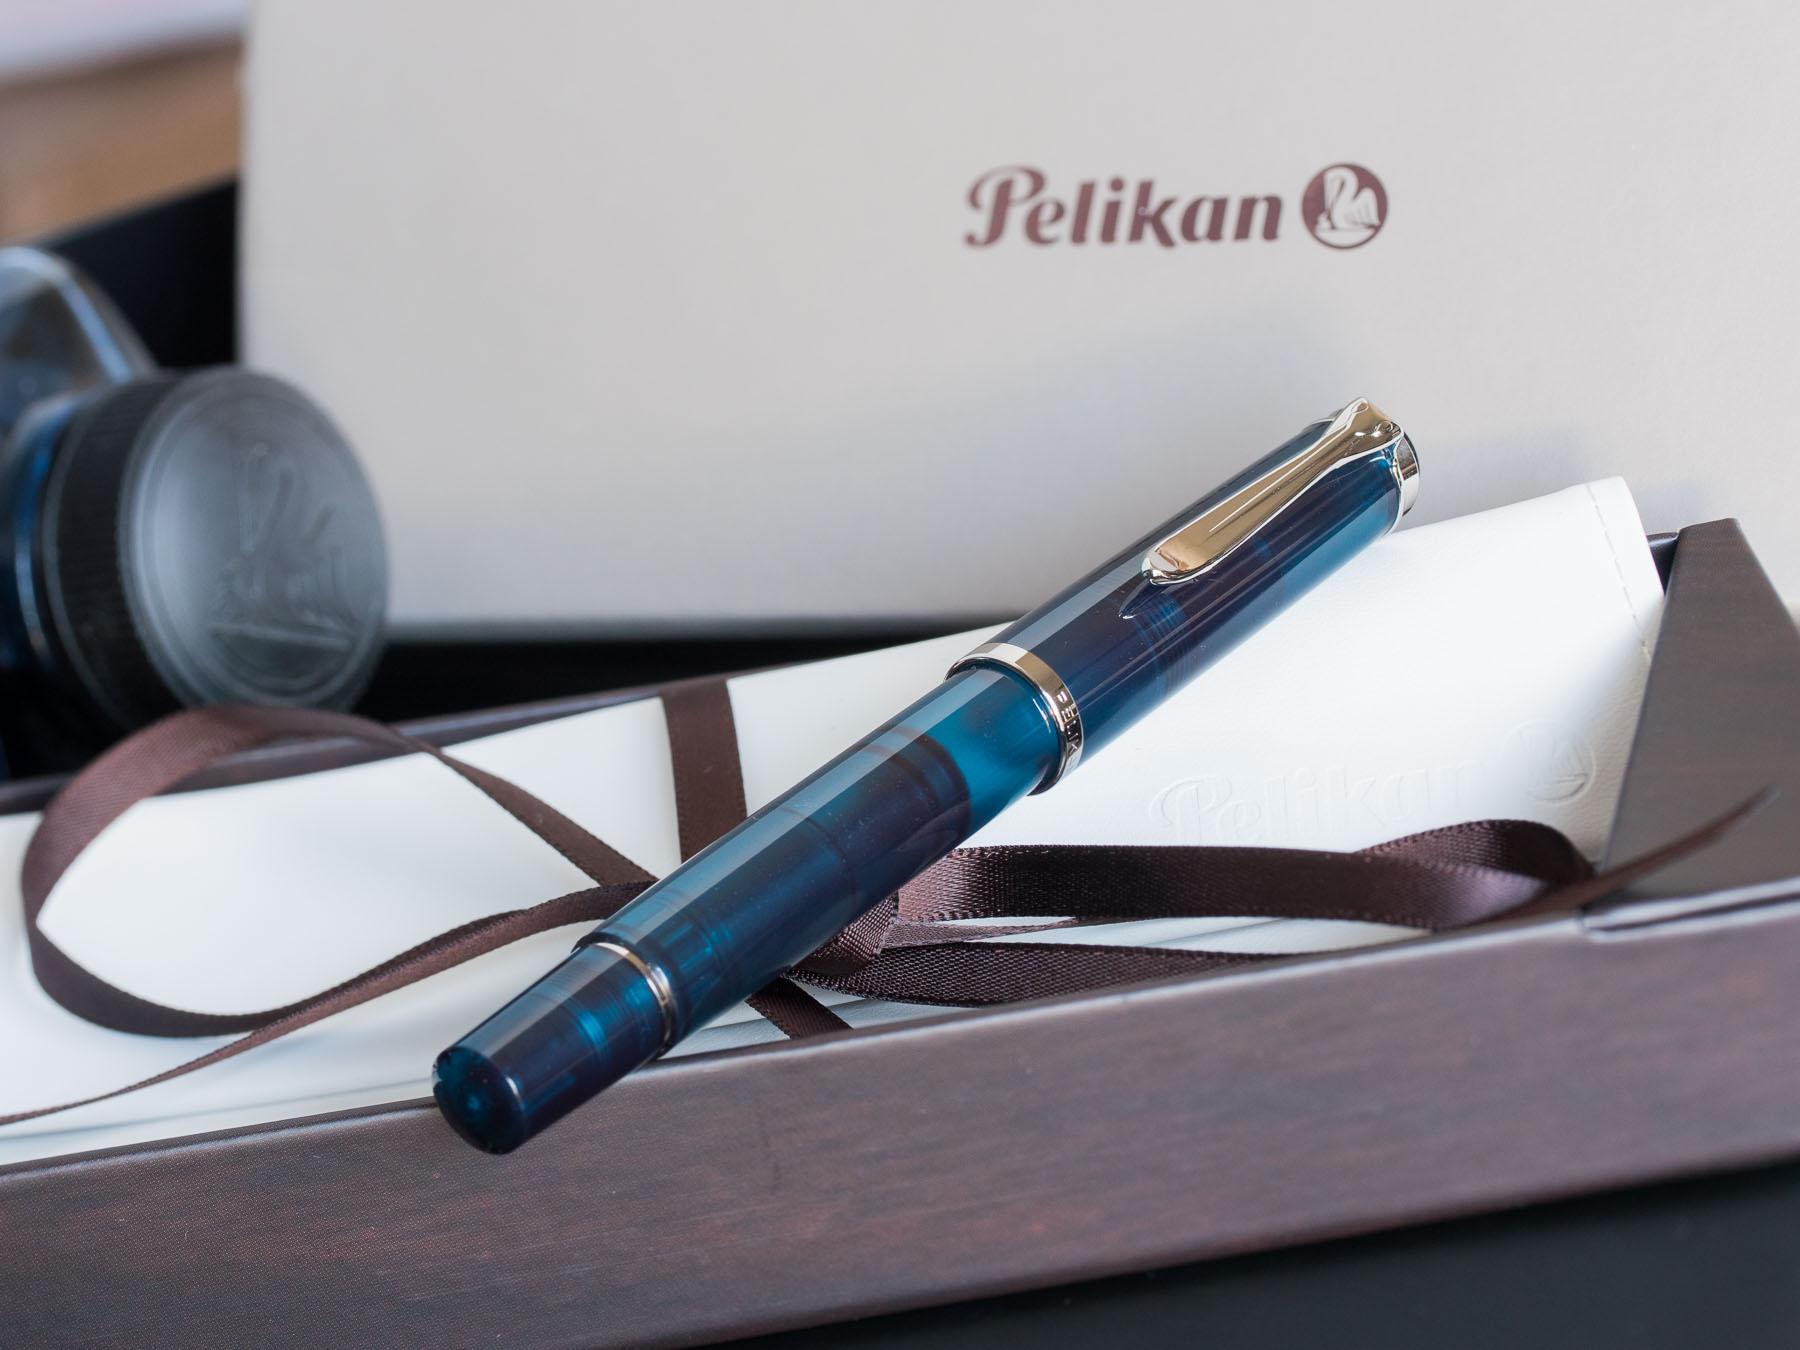 pelikan_m205_aquamarine_fountain_pen_low_res-21